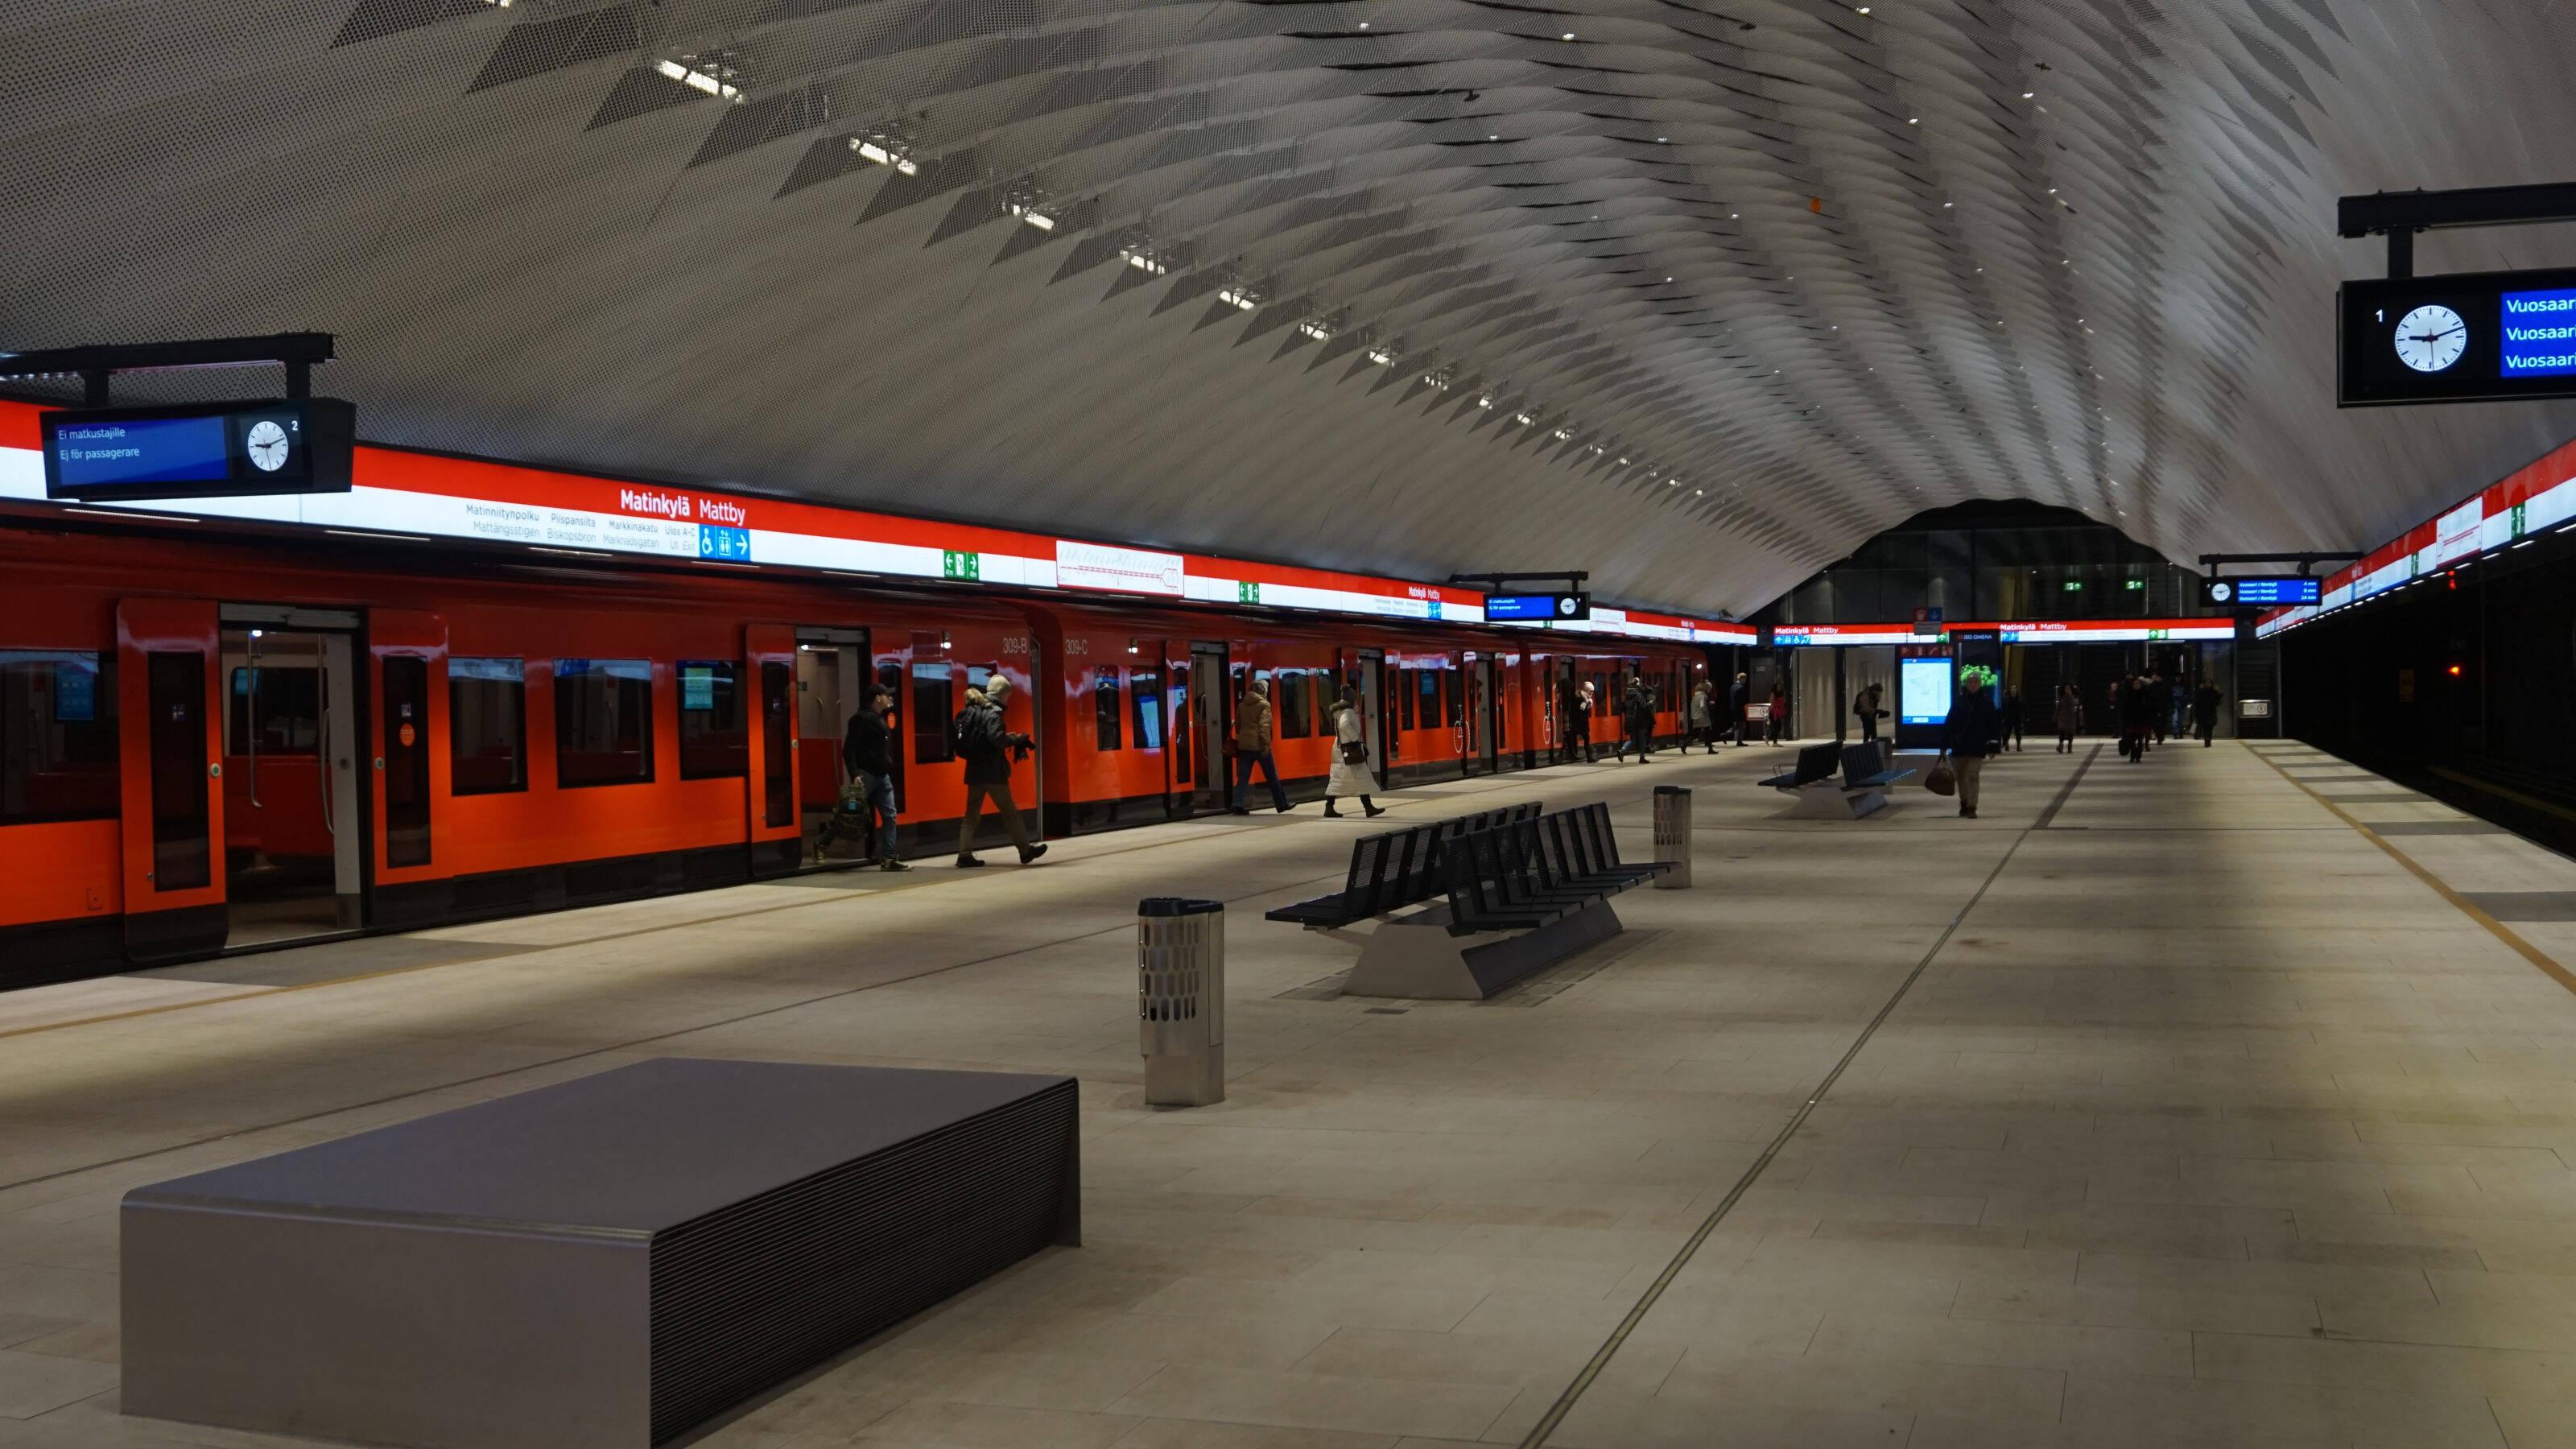 The Helsinki Metro System Is A Major Transit Hub In